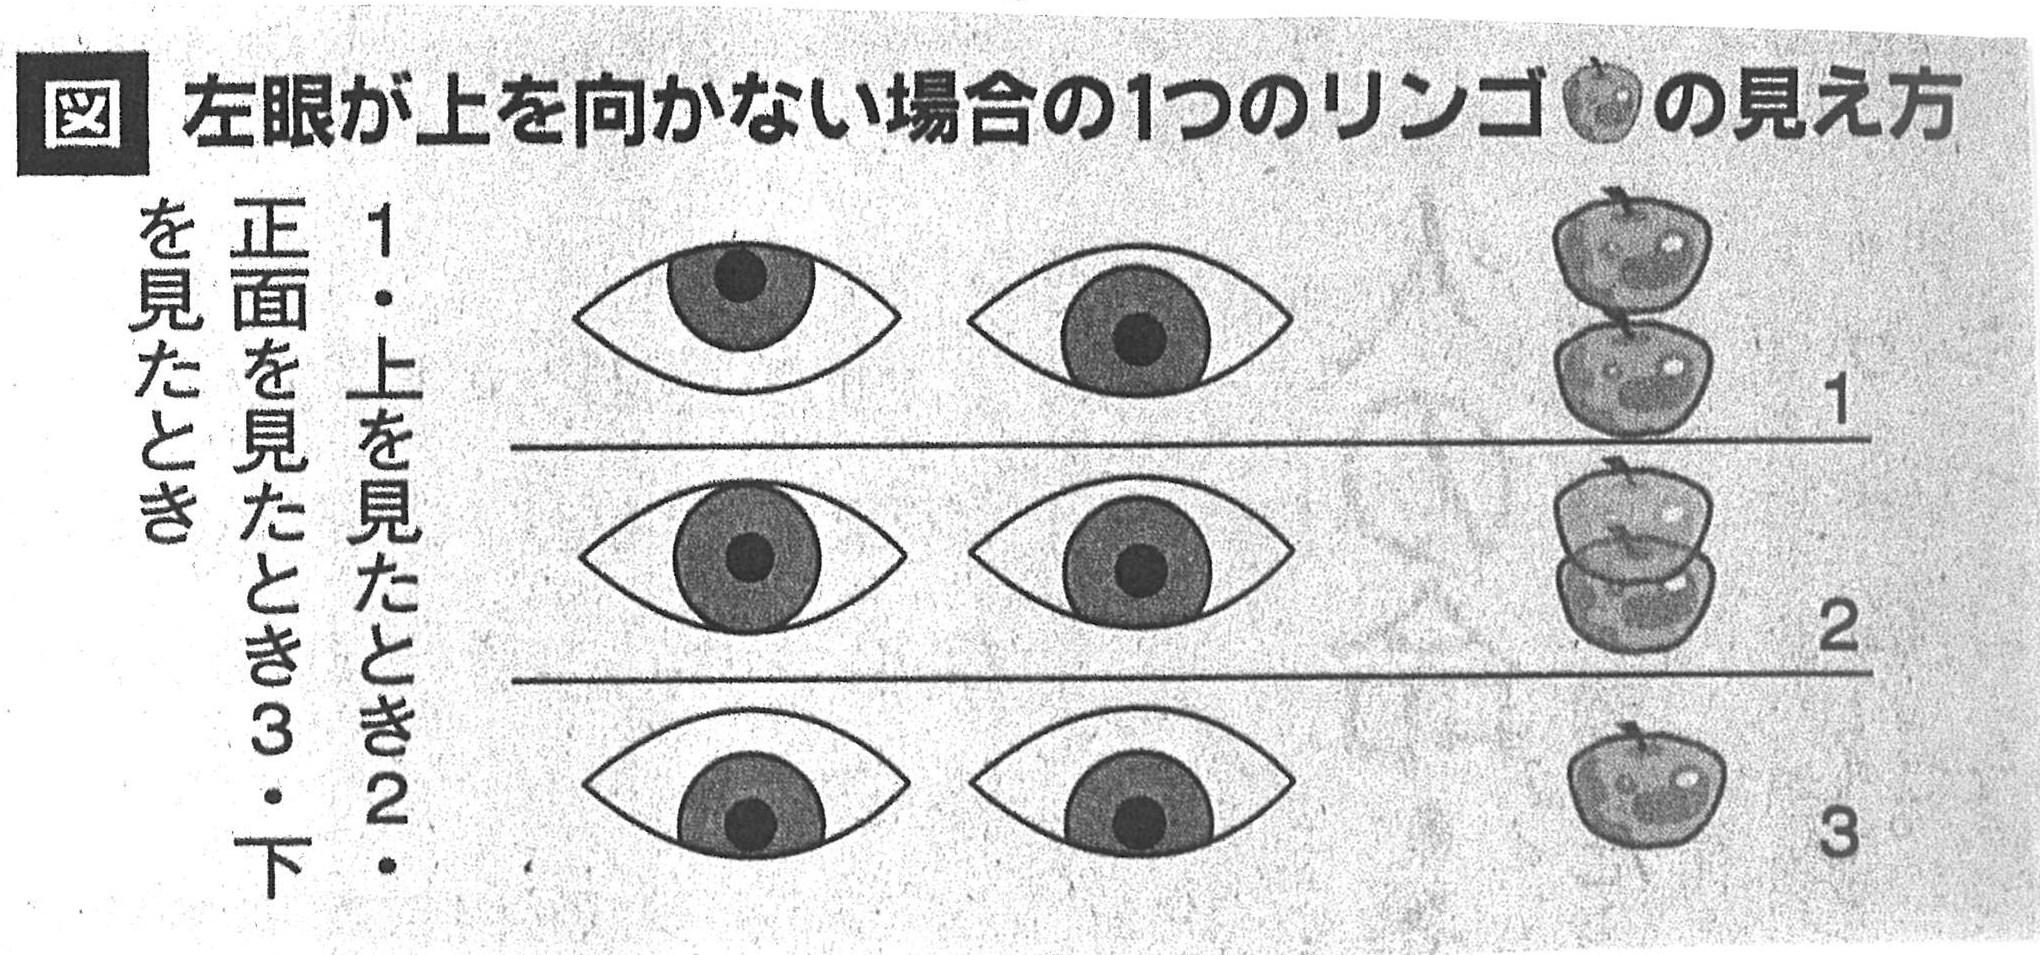 複視 - 徳島県医師会Webサイト